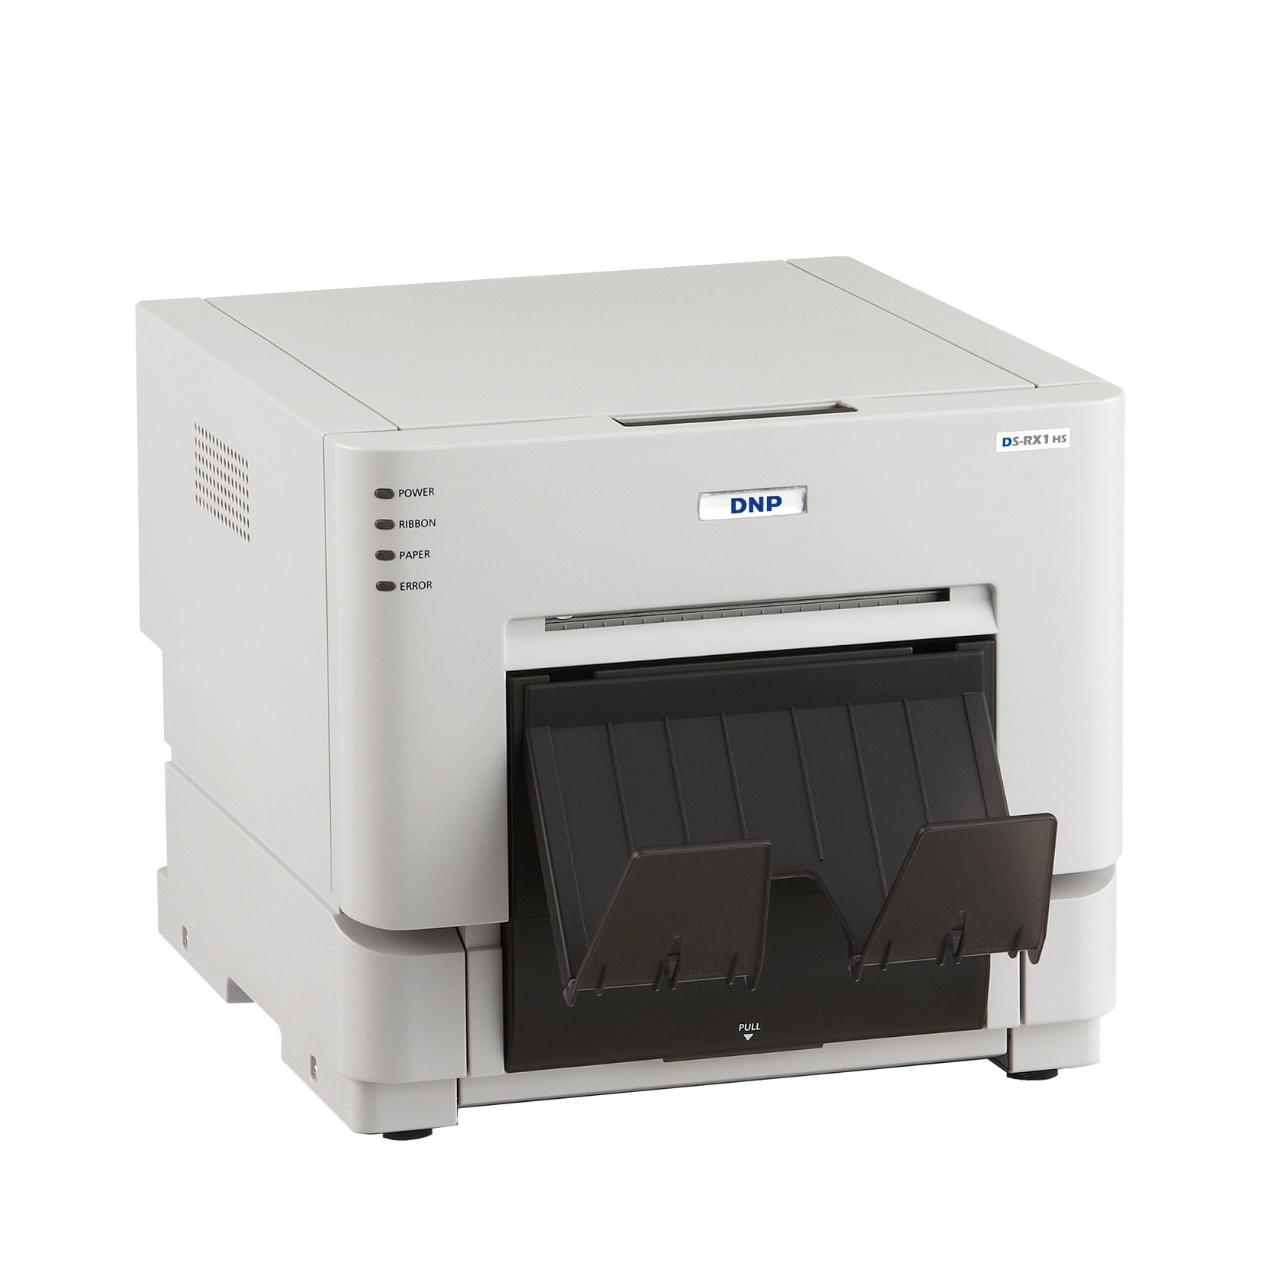 impresora dnp ds rx1hs